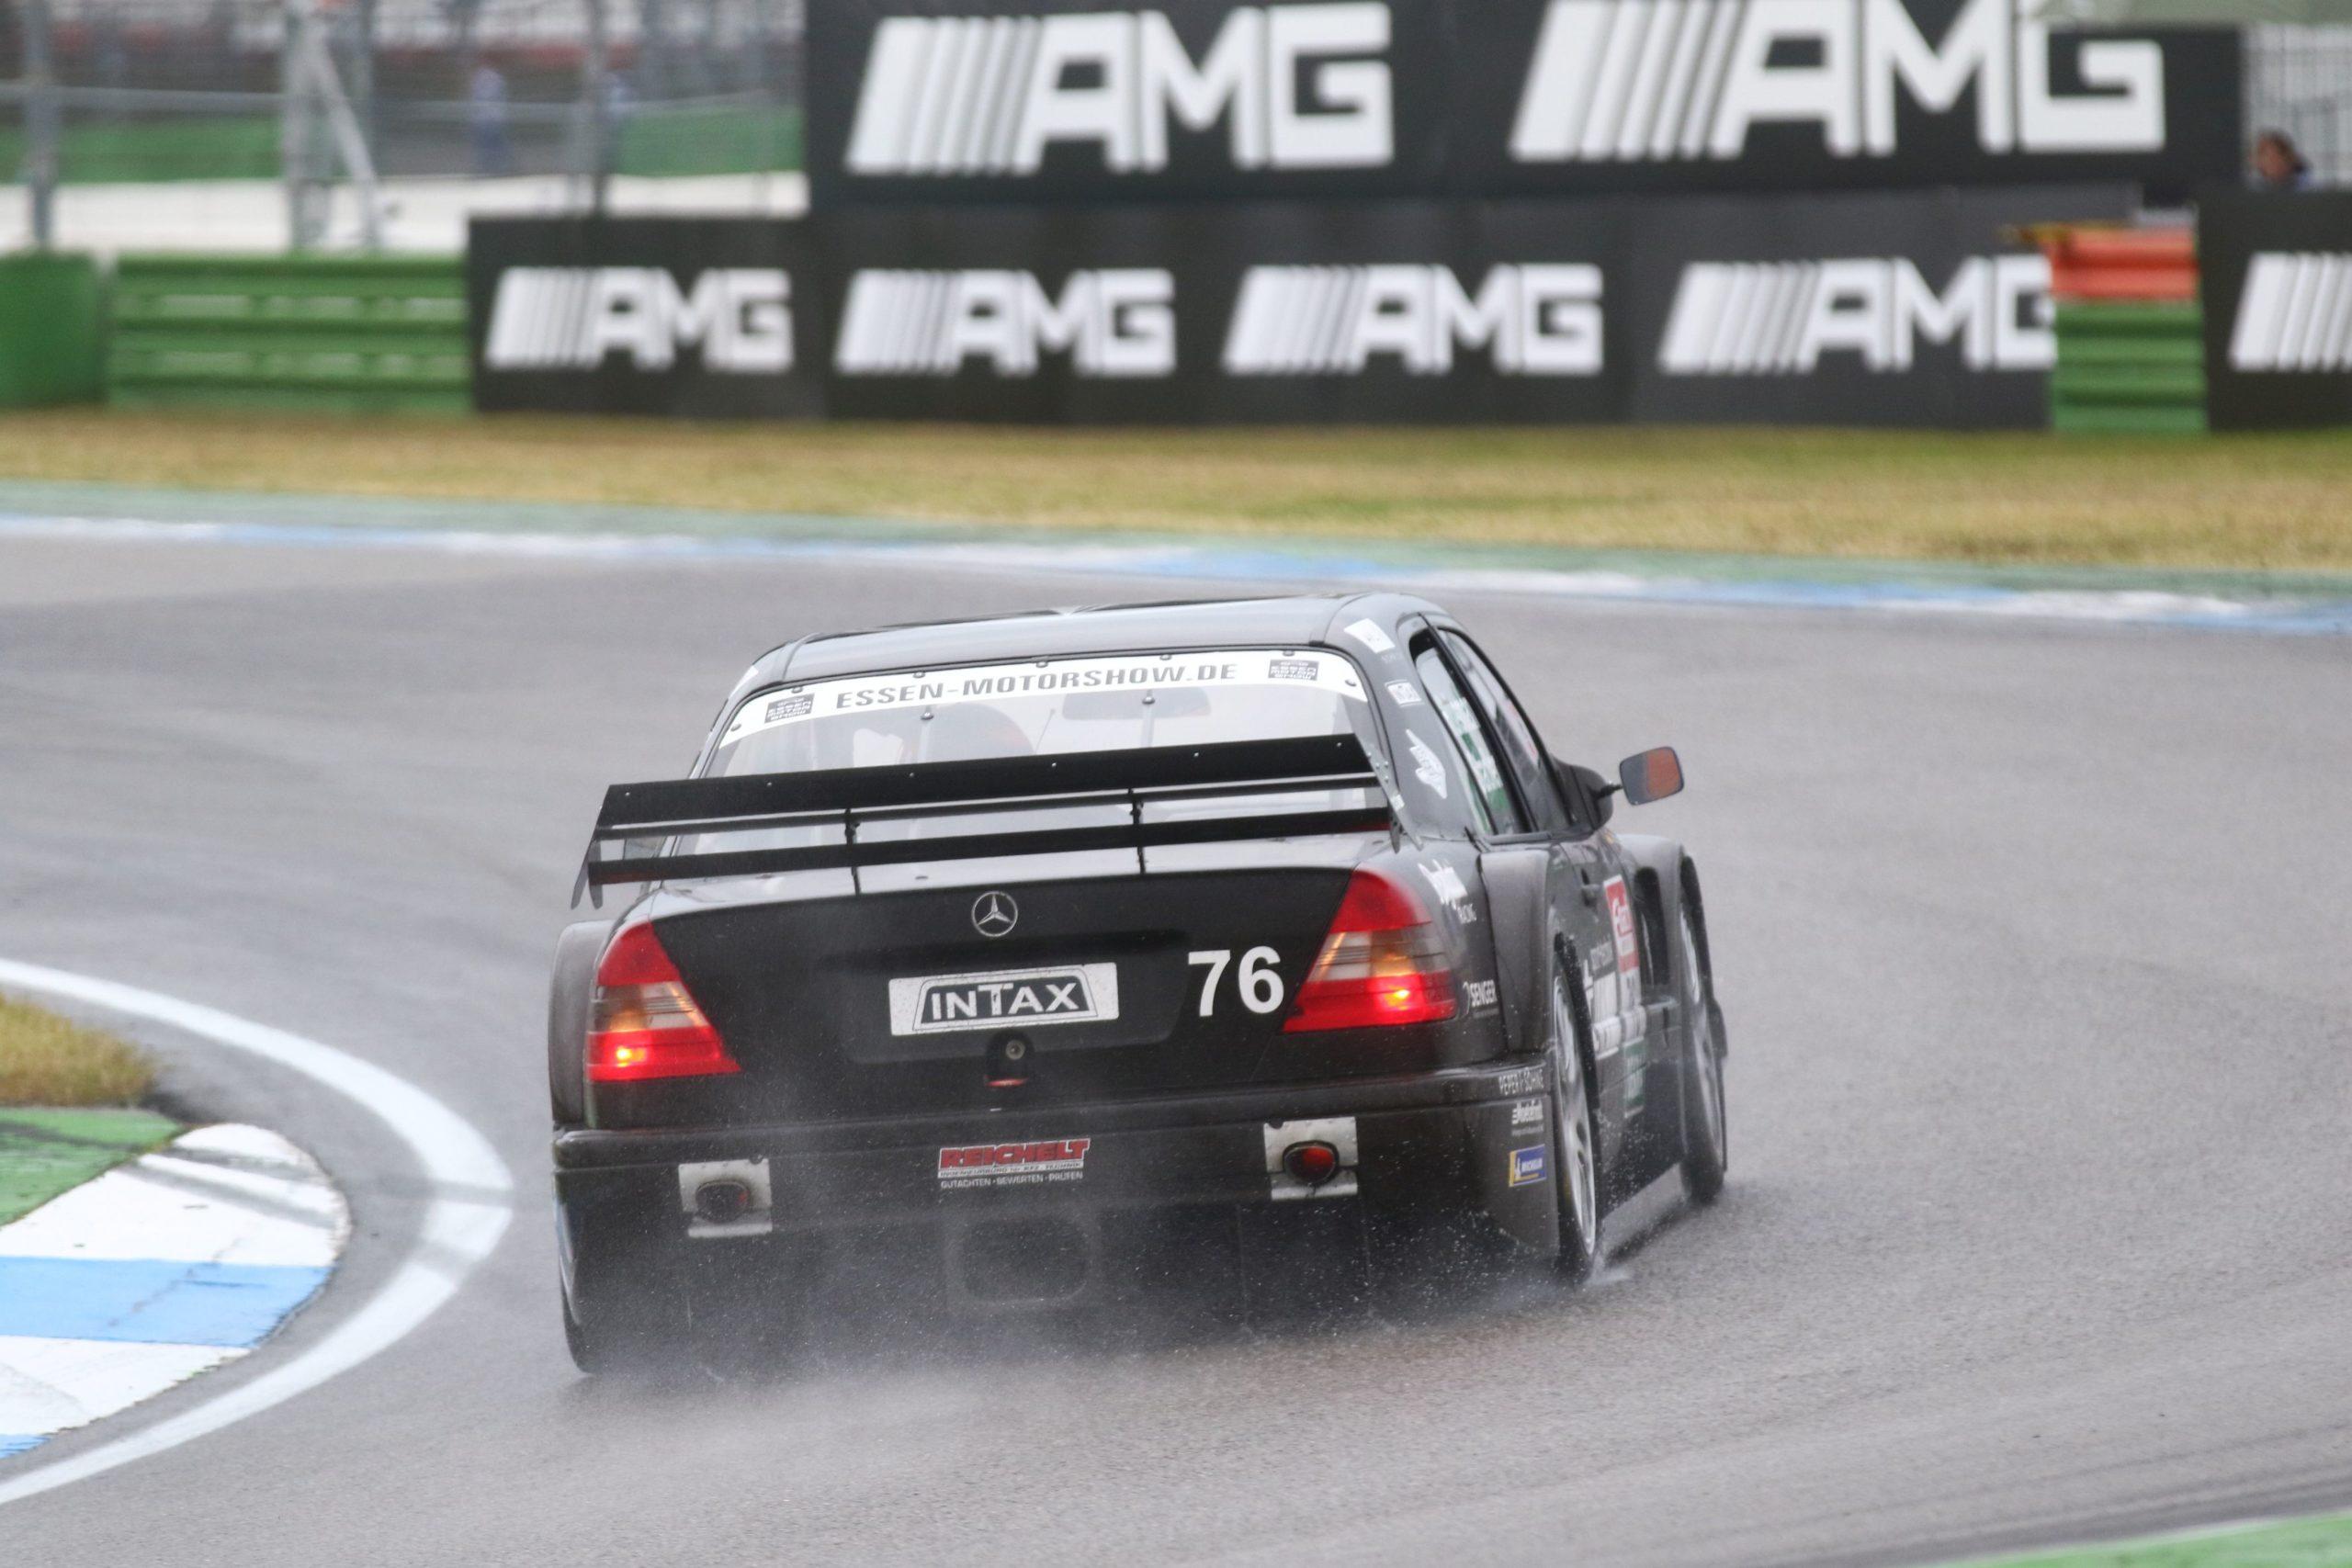 DTM-Classic-tst-sport-und-technik-Mercedes-Benz-Patrick-Huisman-2130002